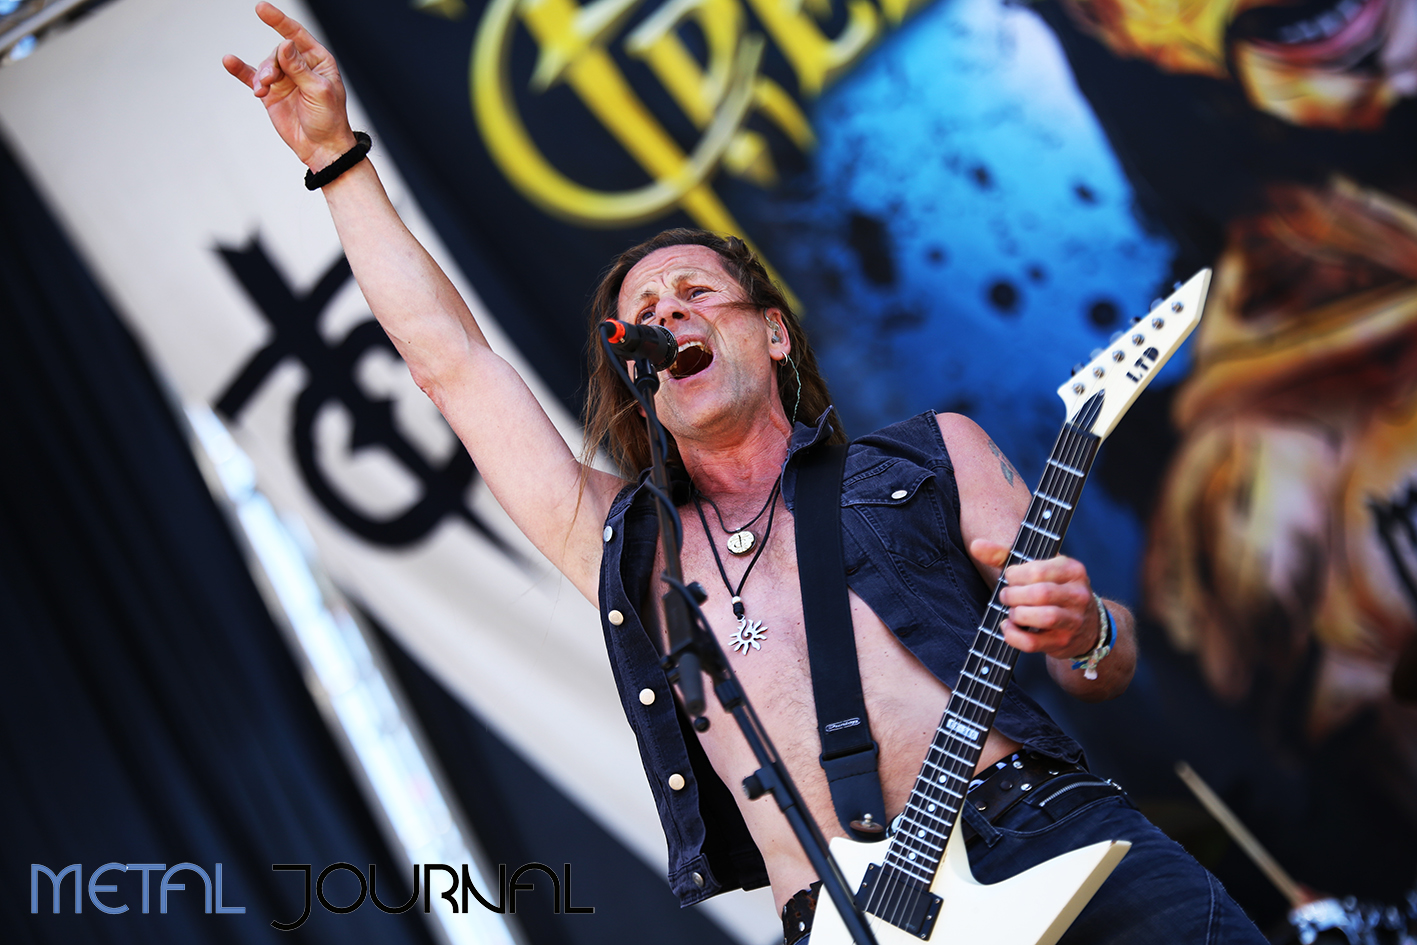 freedom call metal journal rock the coast 2019 pic 7